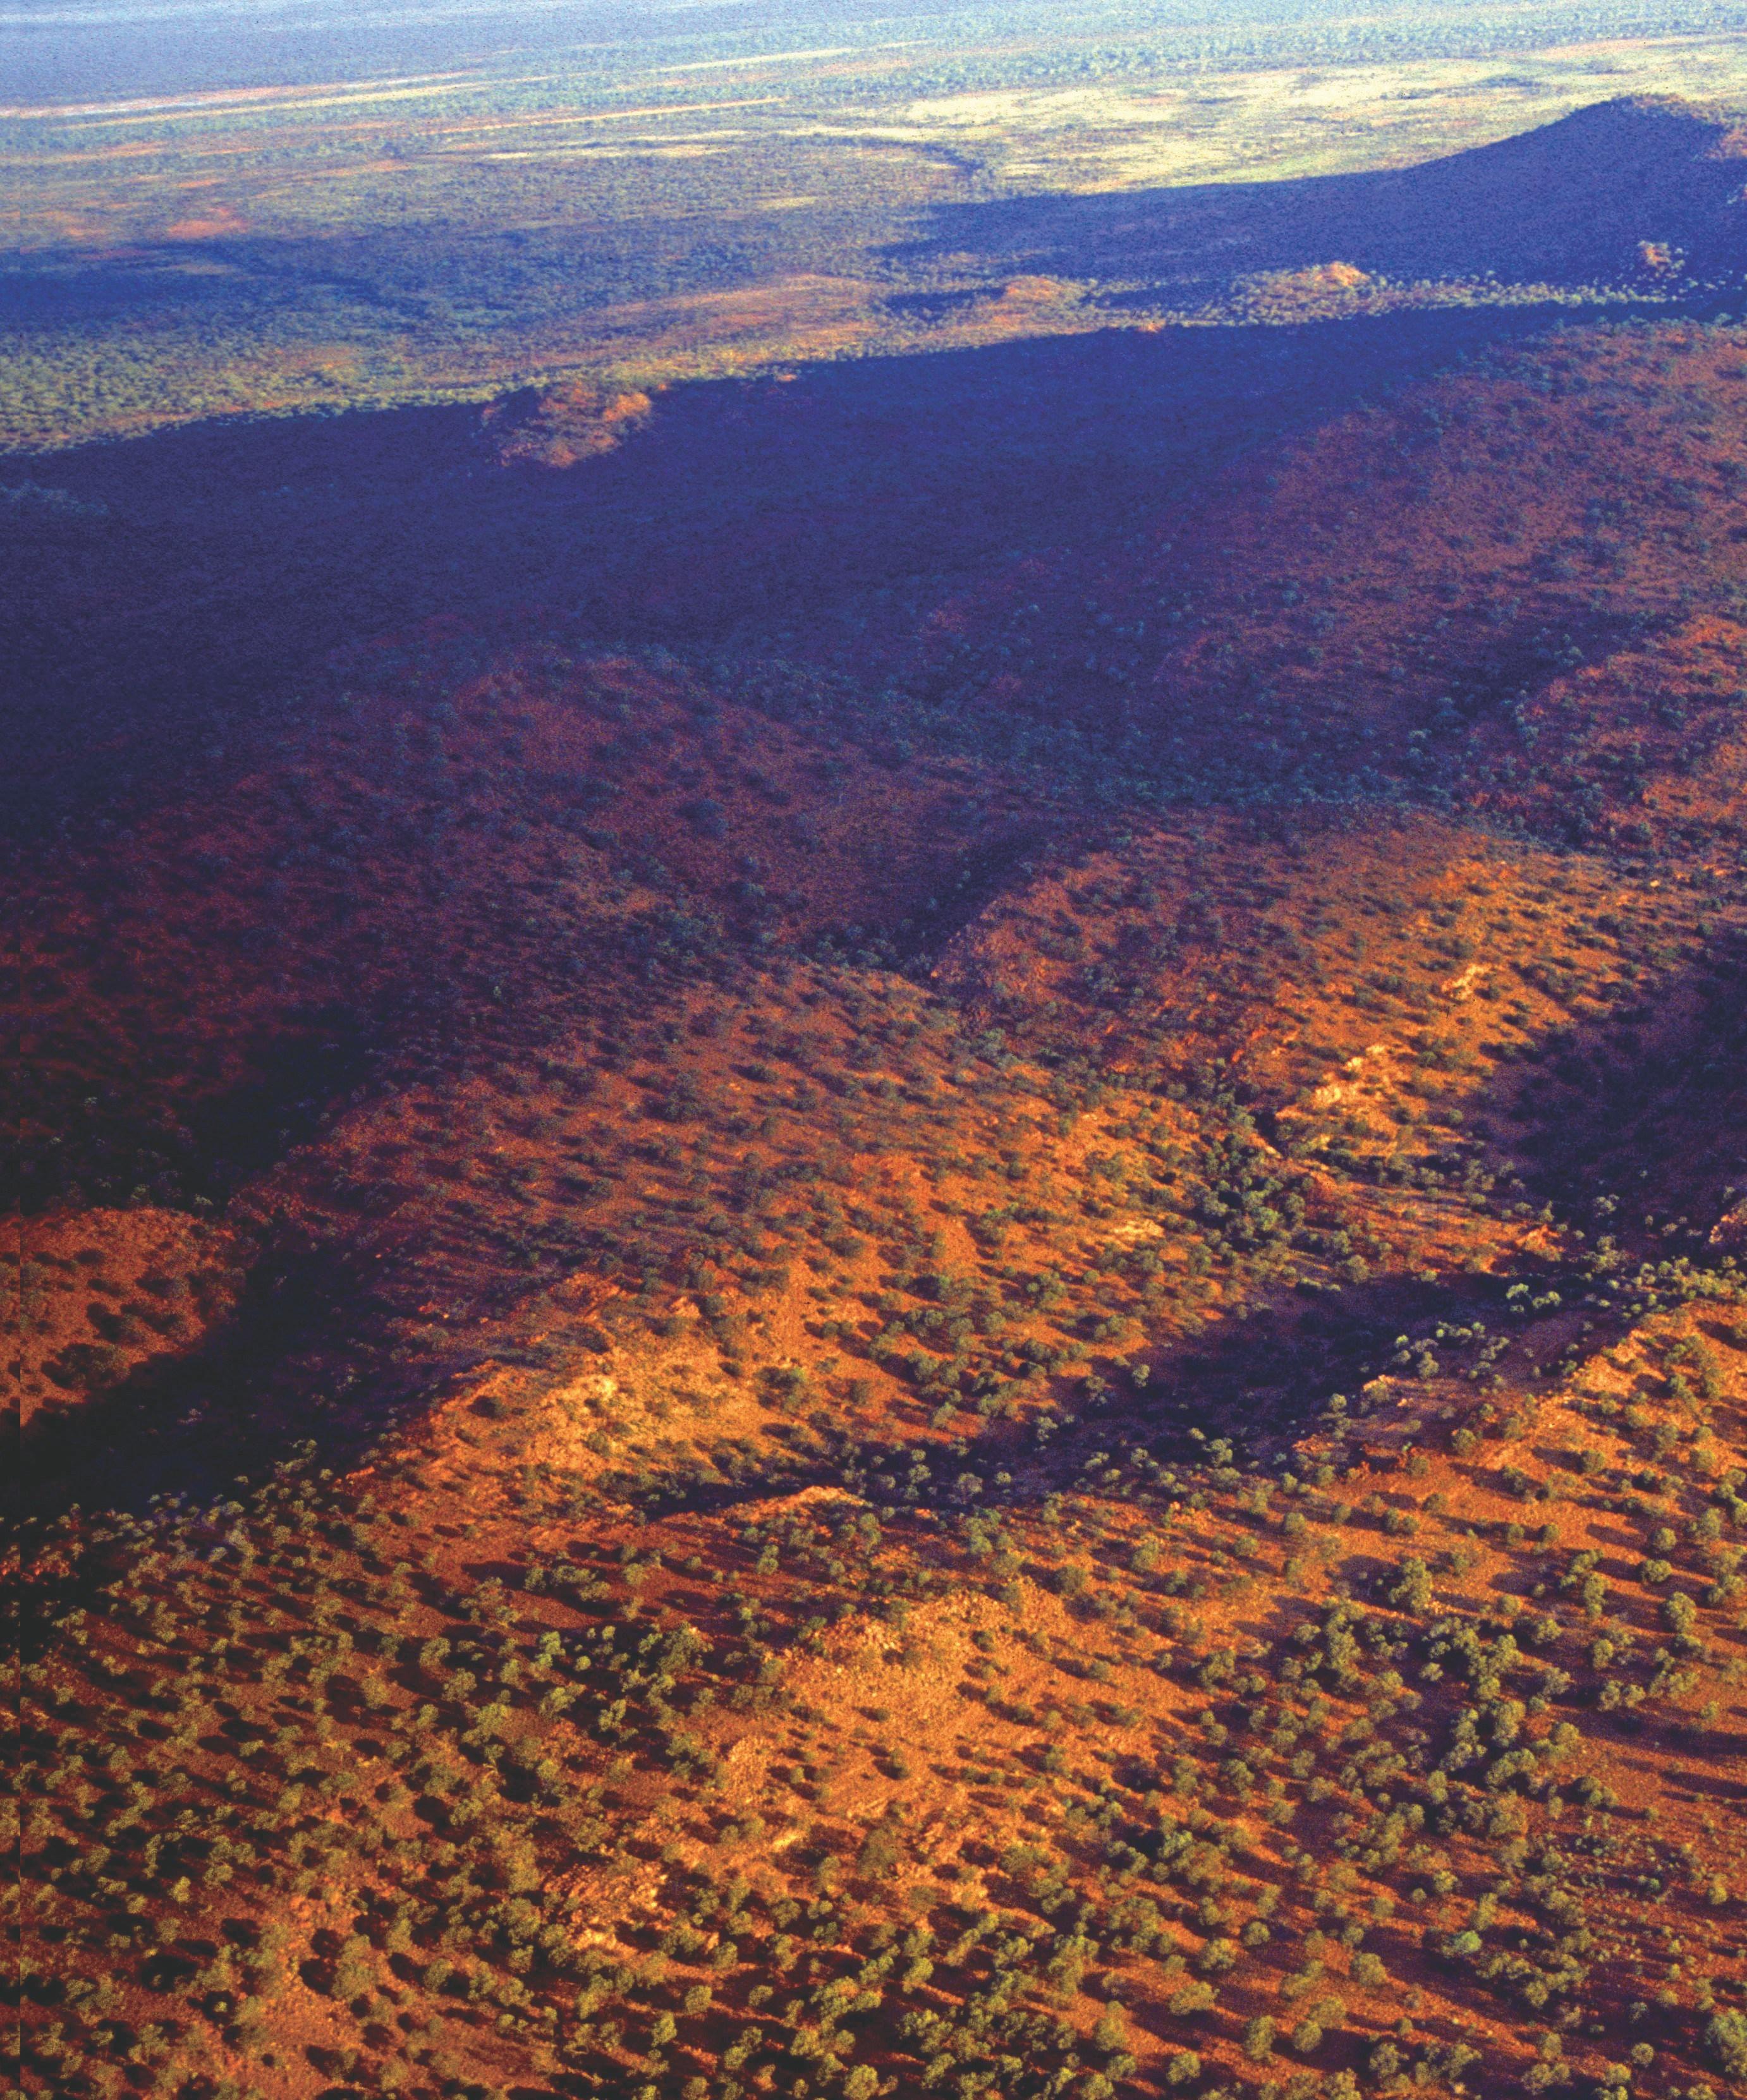 Mt. Narryer Australia (c) L. Sue Baugh